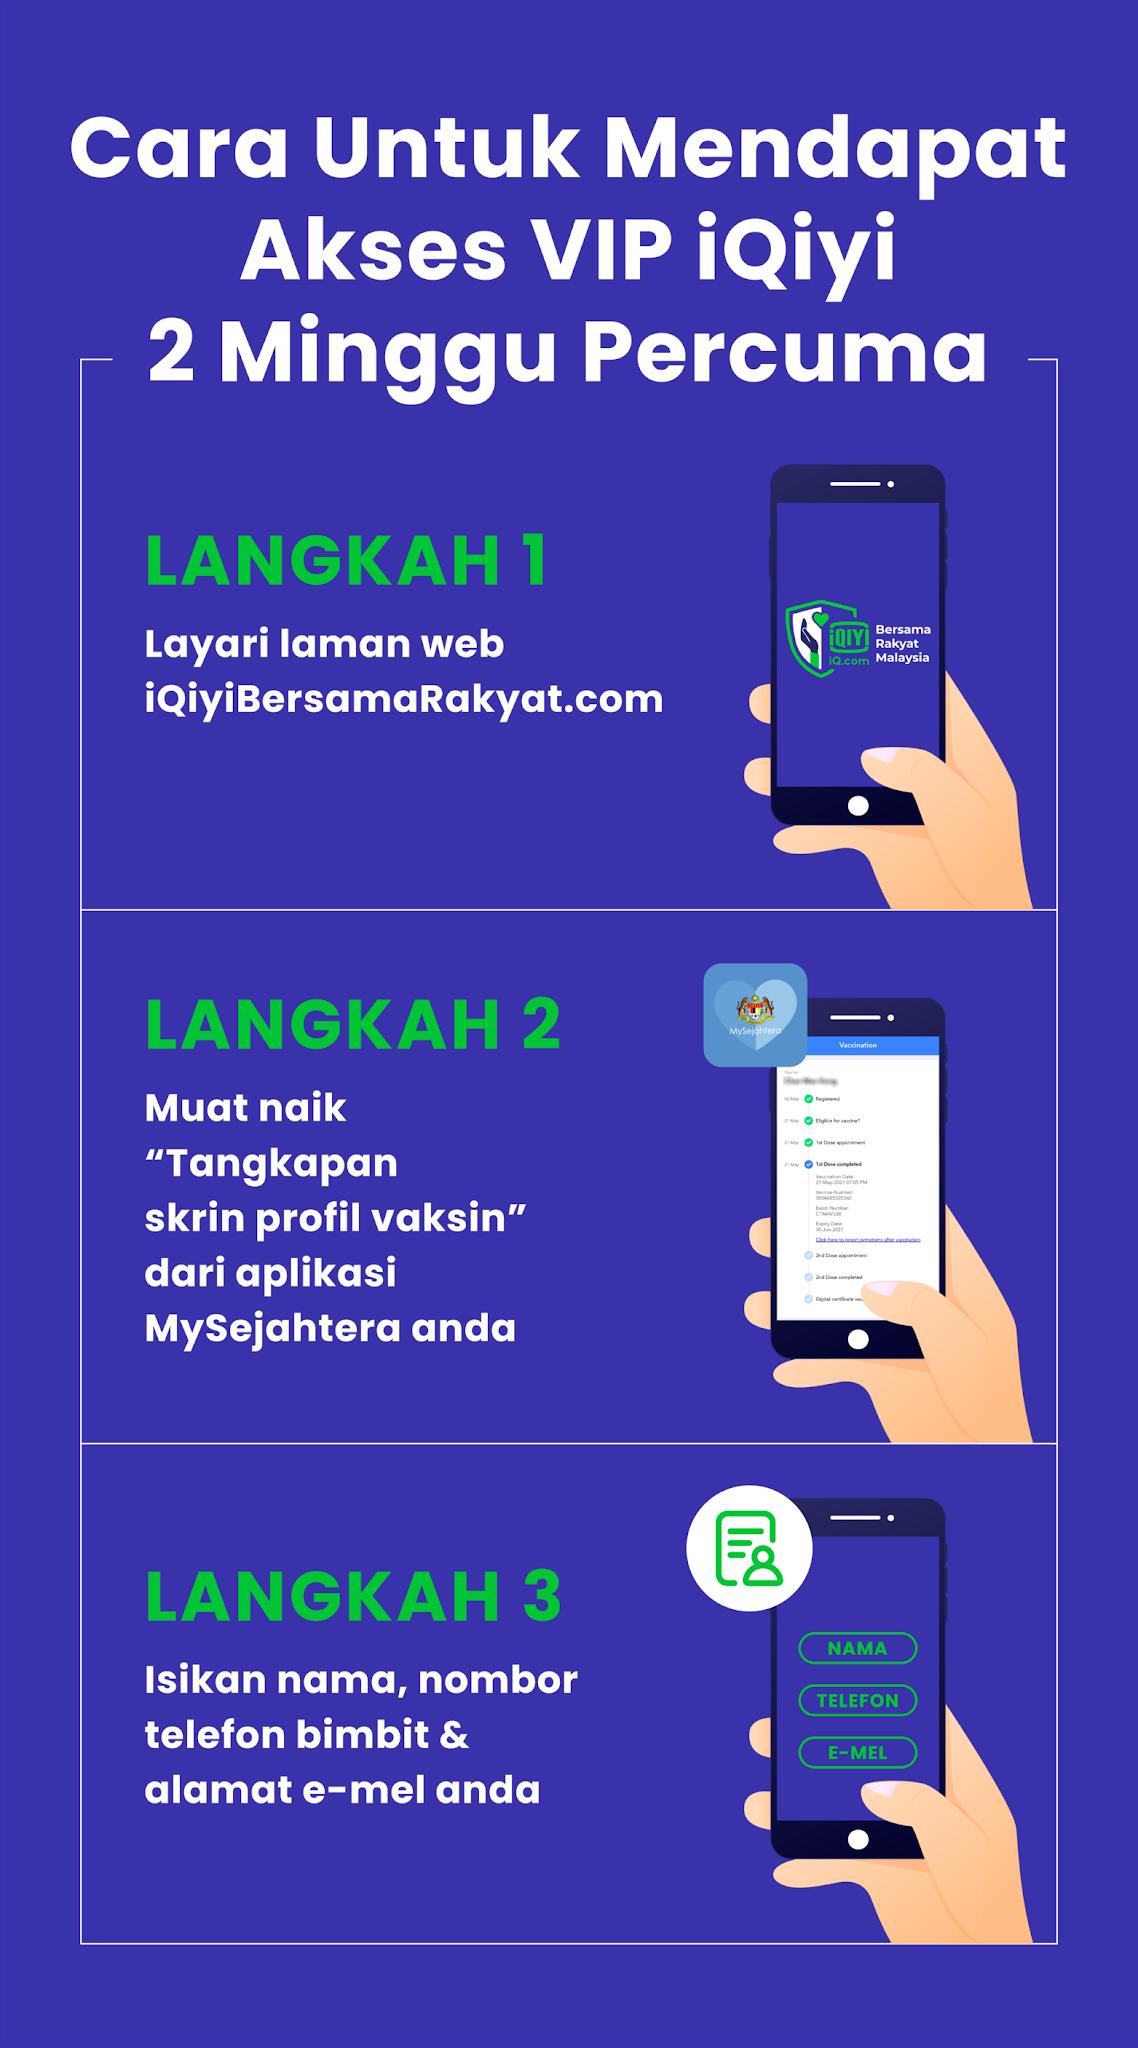 Kerjasama iQiyi dan CITF sempena kempen iQiyi Bersama Rakyat Malaysia.